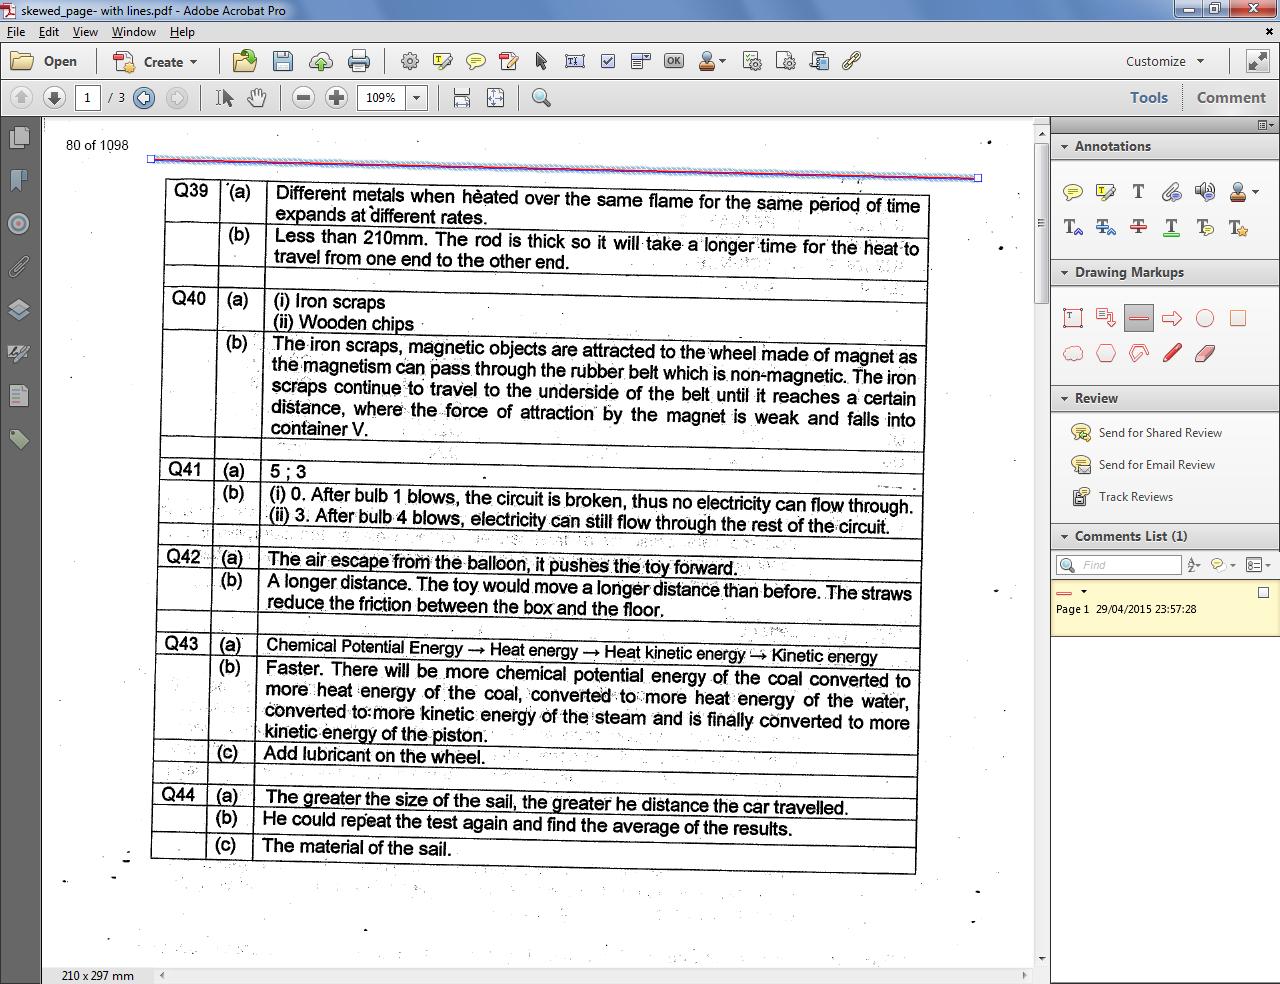 how to deskew a pdf file